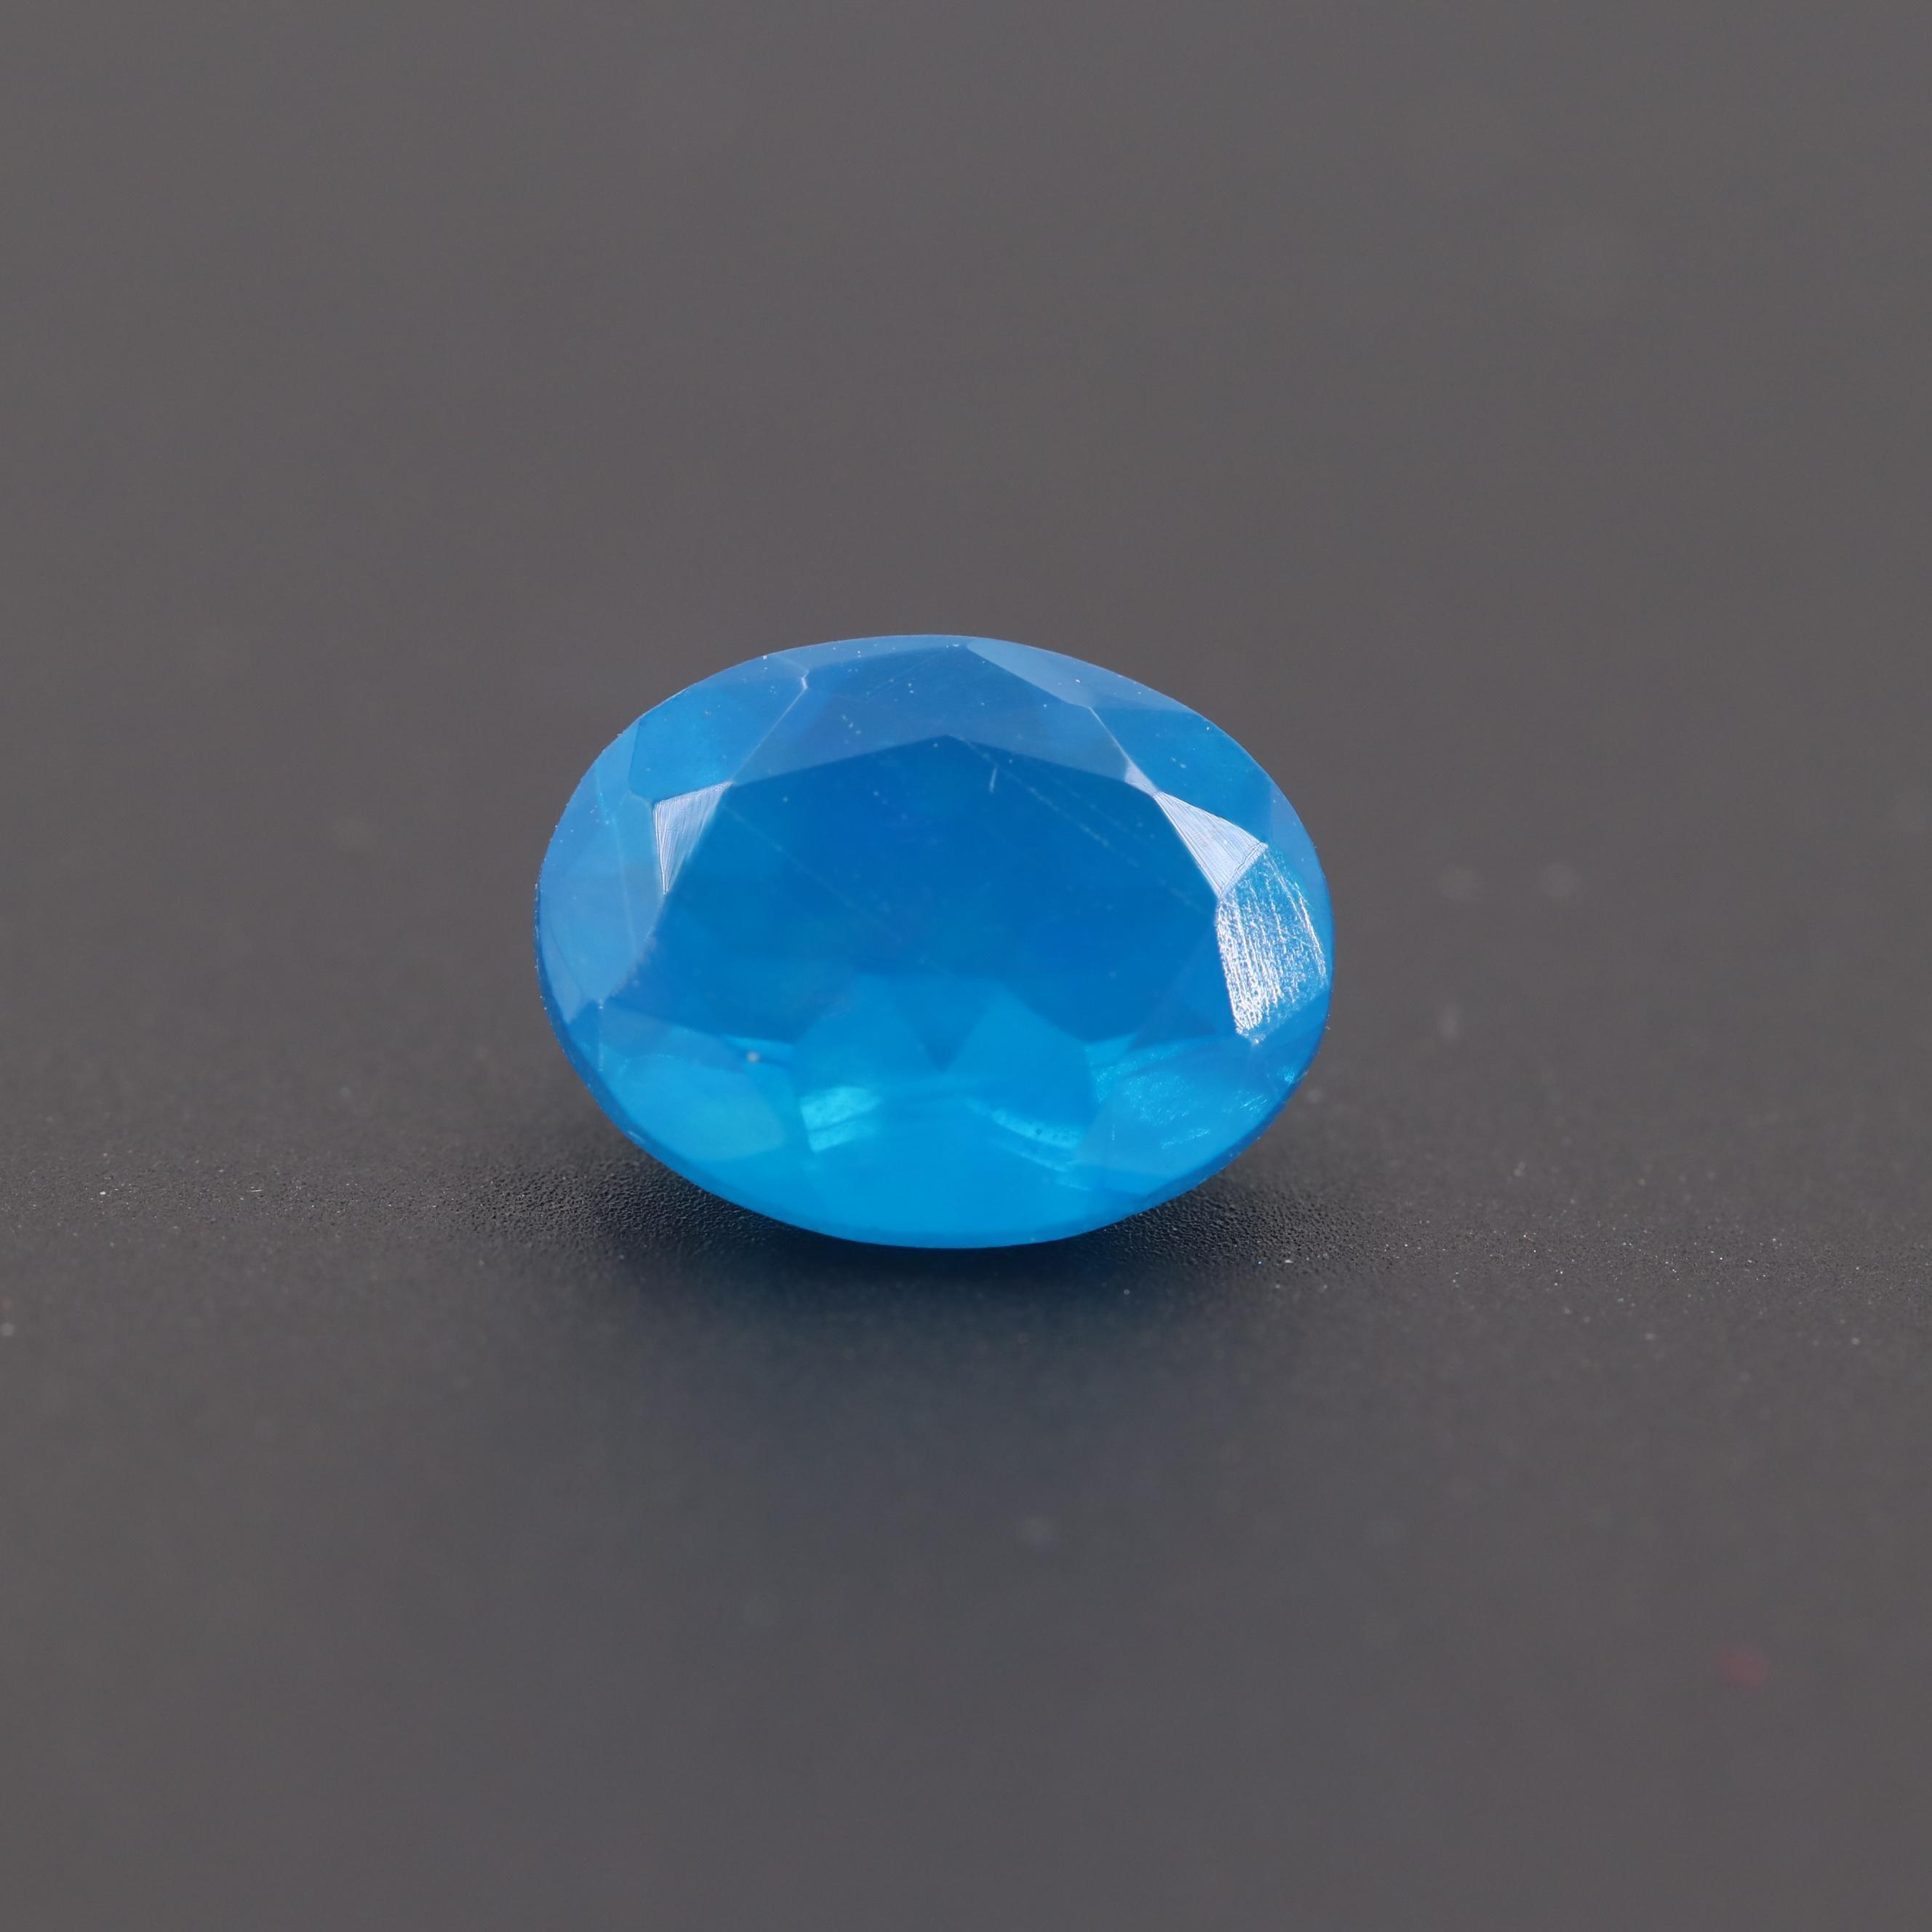 Loose 1.14 CT Opal